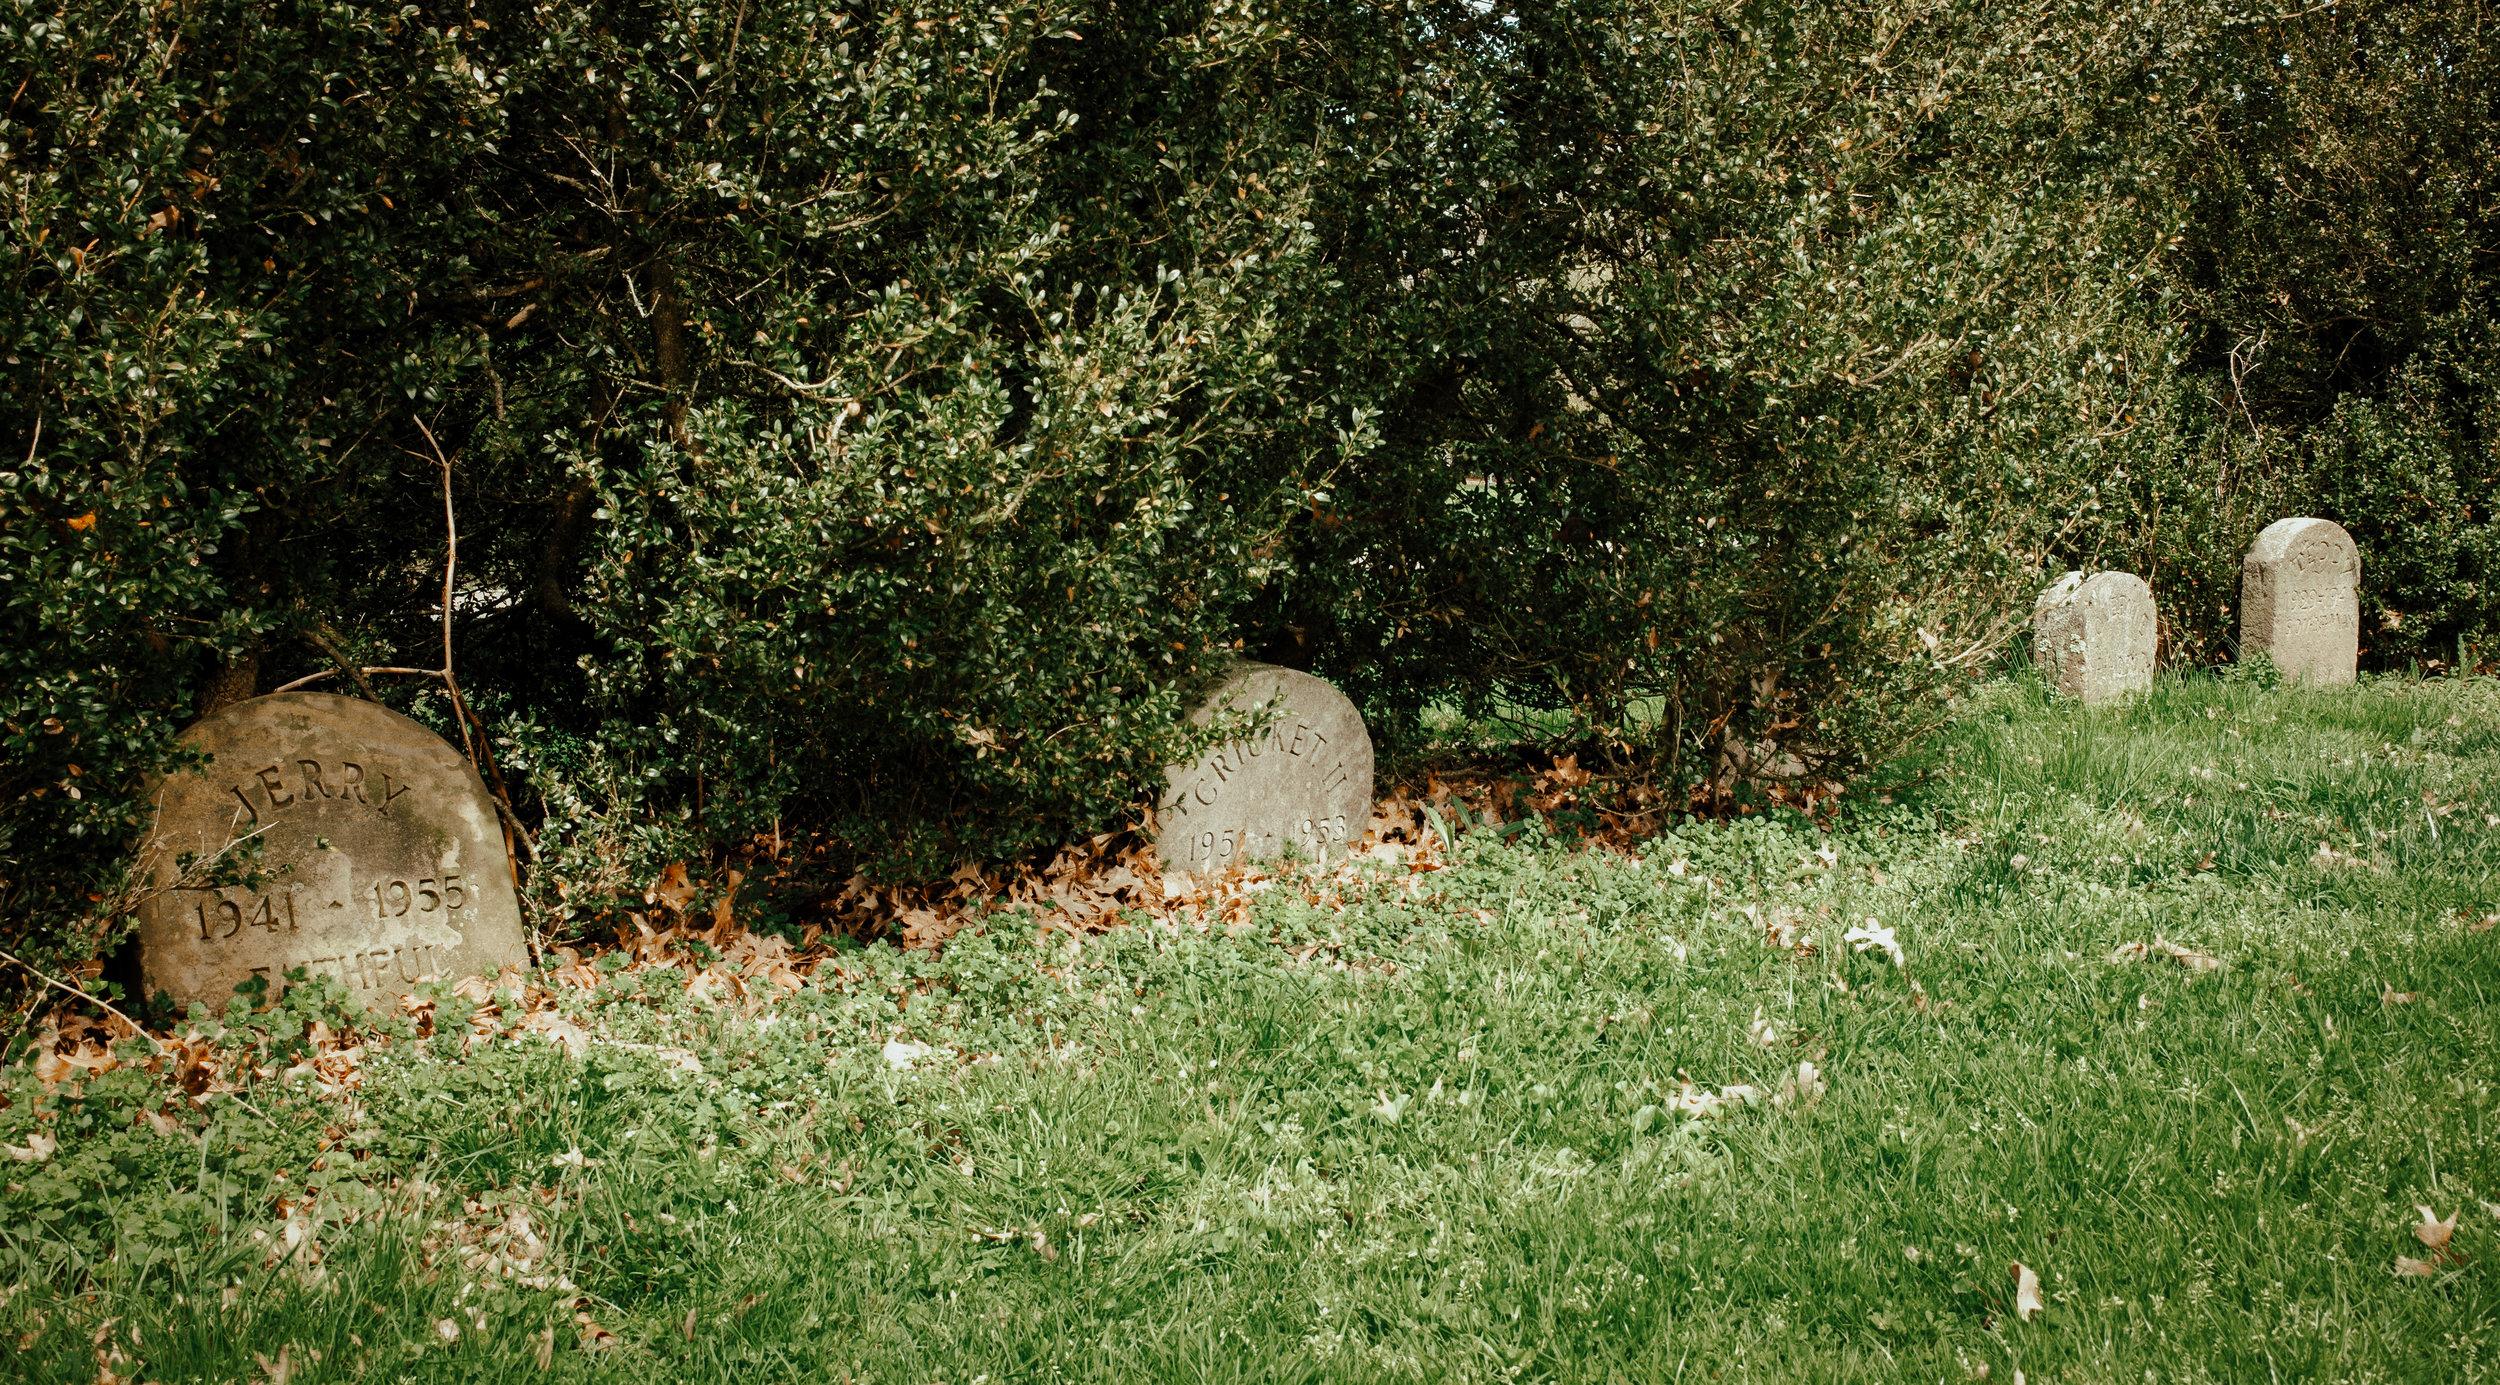 kw-hartwood-pet-cemetery-img2.jpg